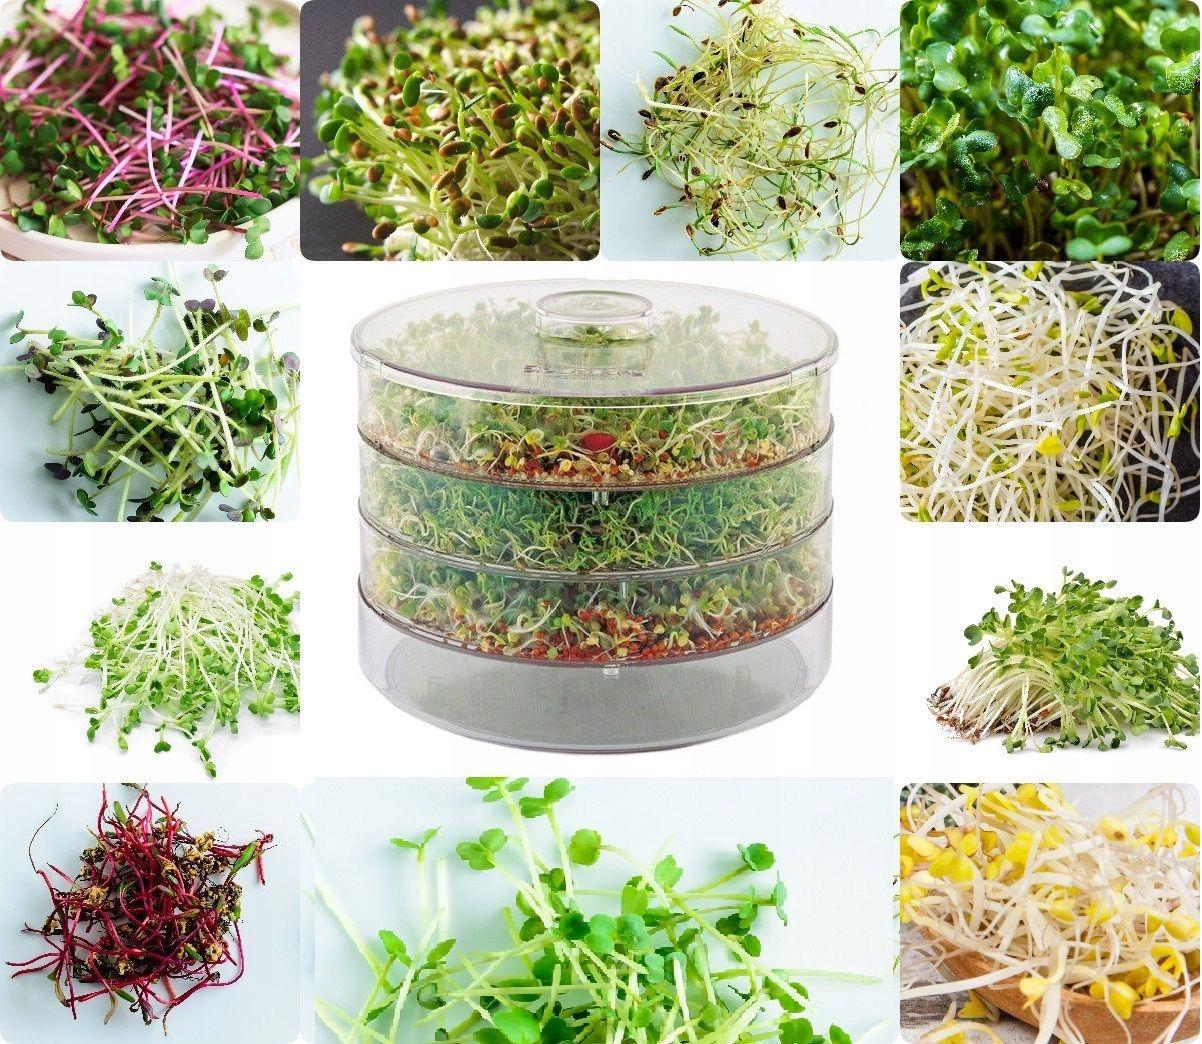 Ящик для ростков x10 семян для проростков без ГМО